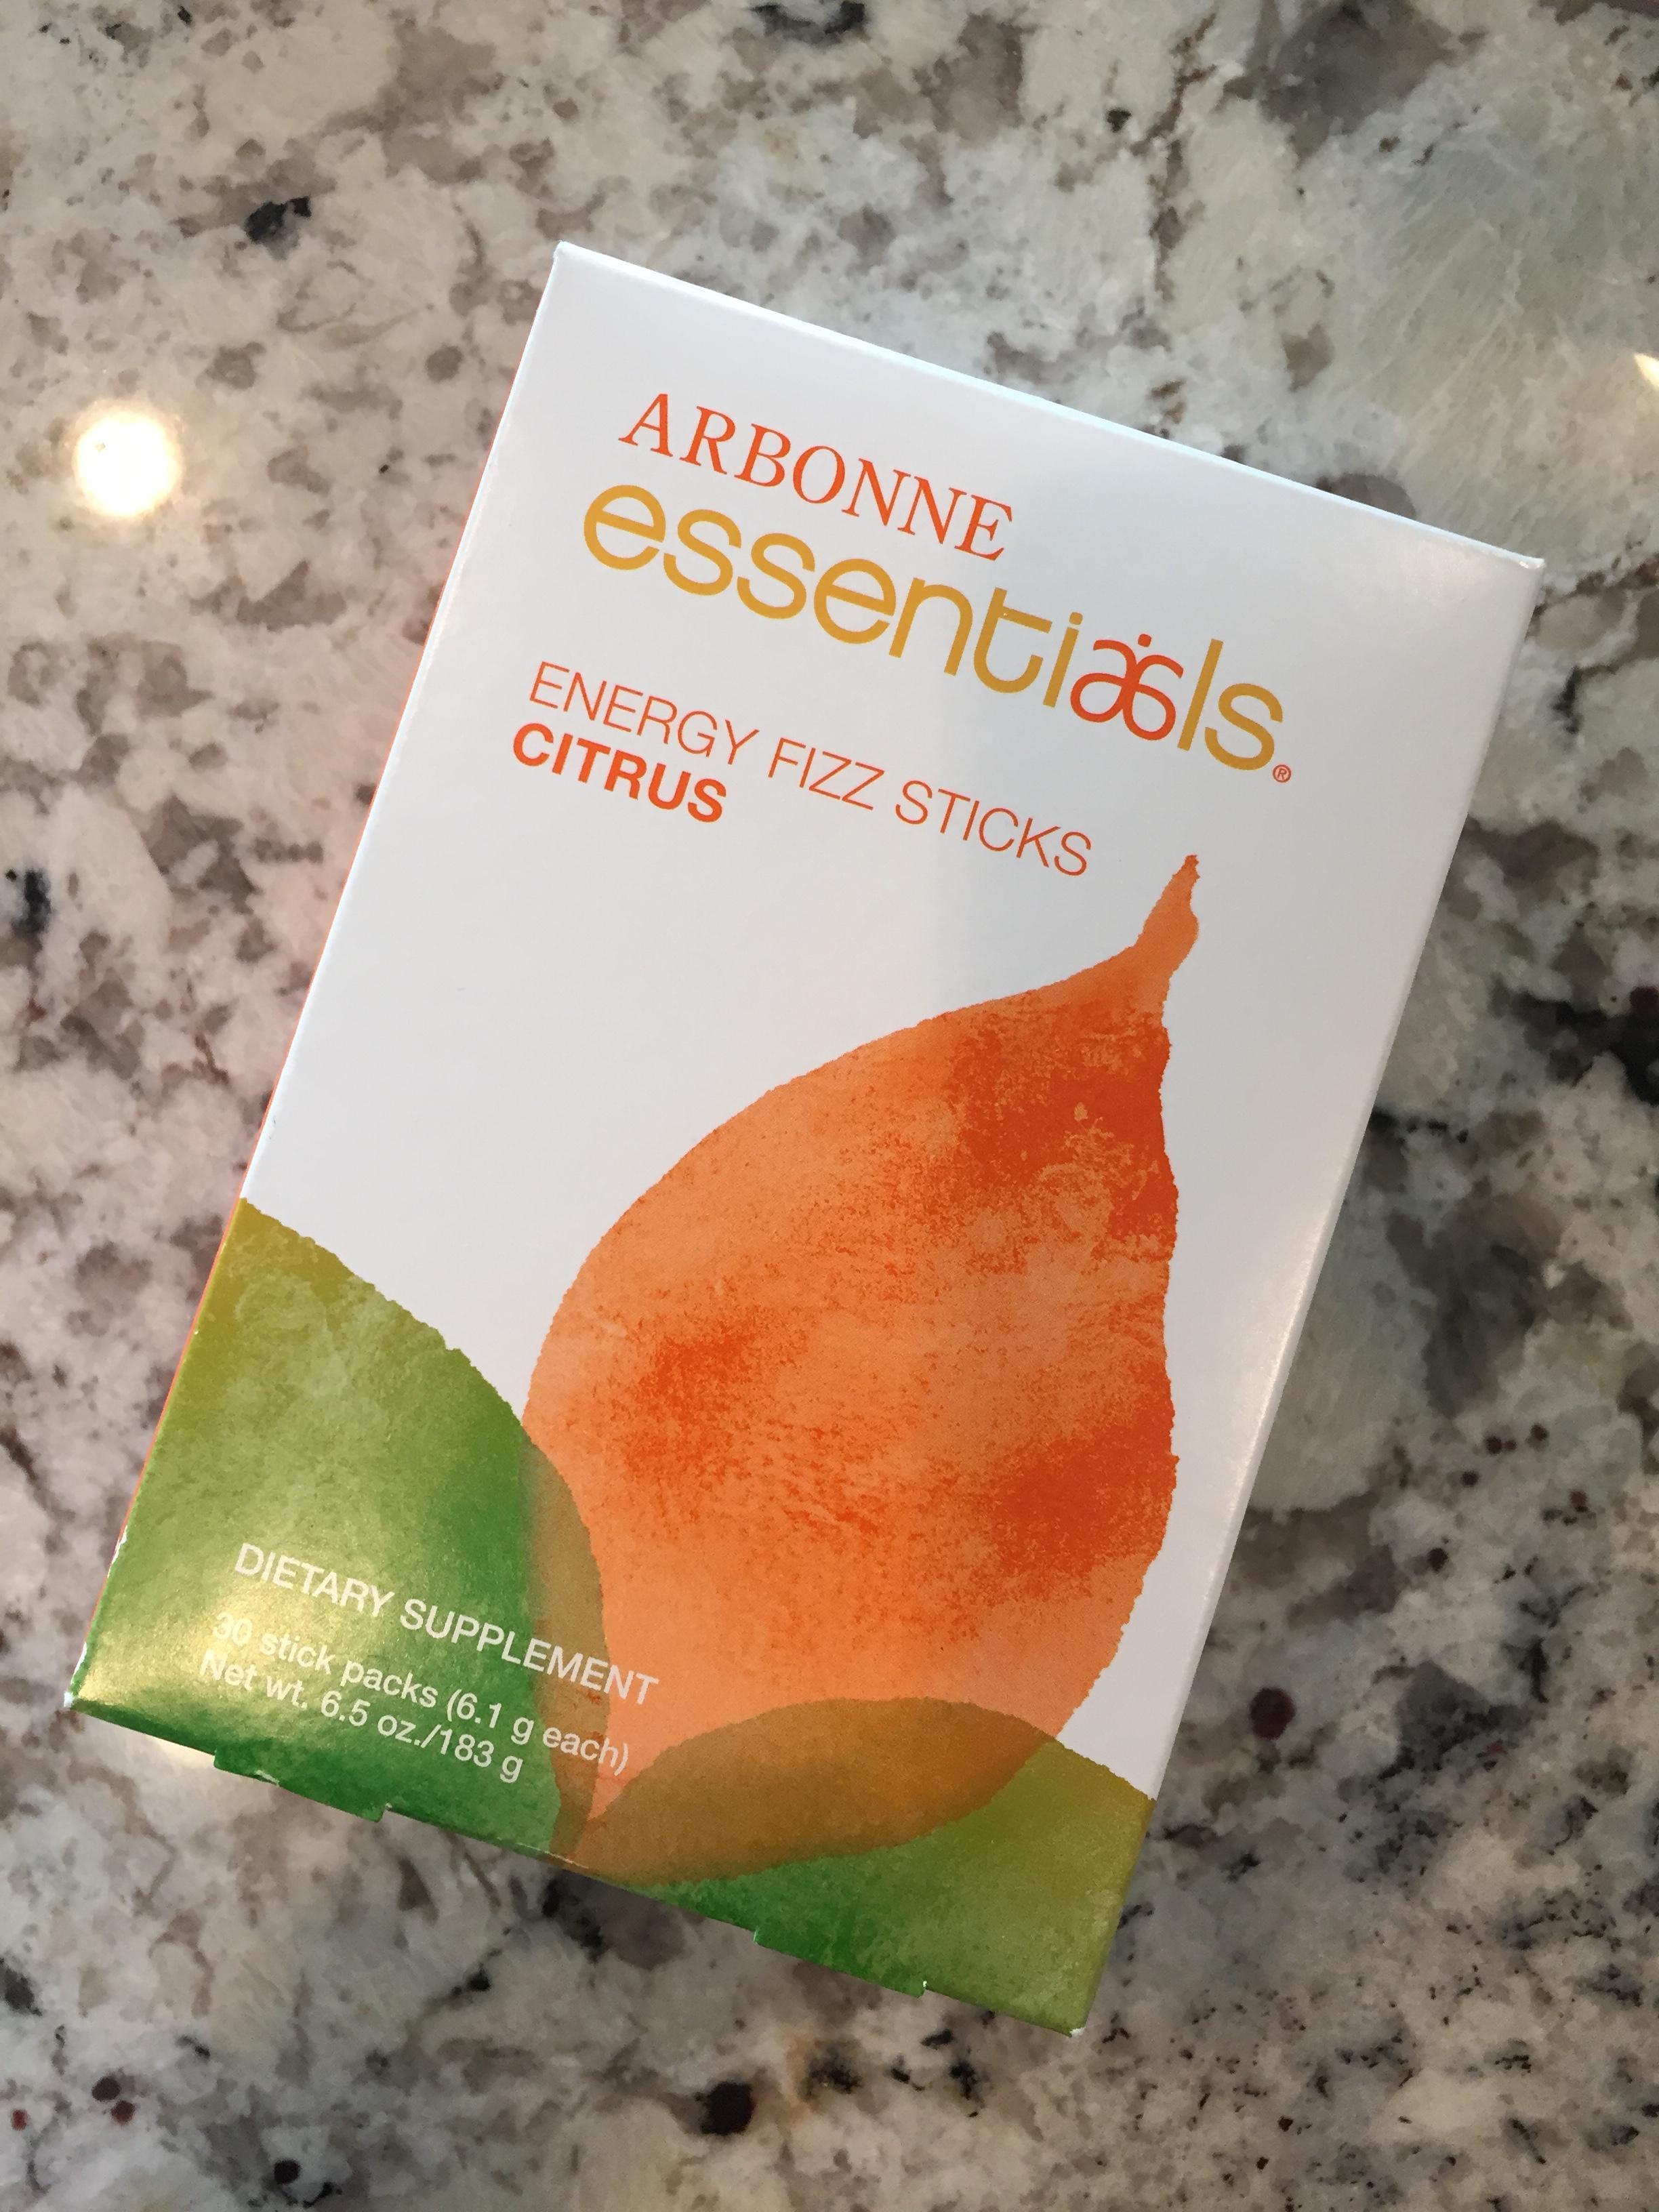 Arbonne Essentials energy fizz sticks